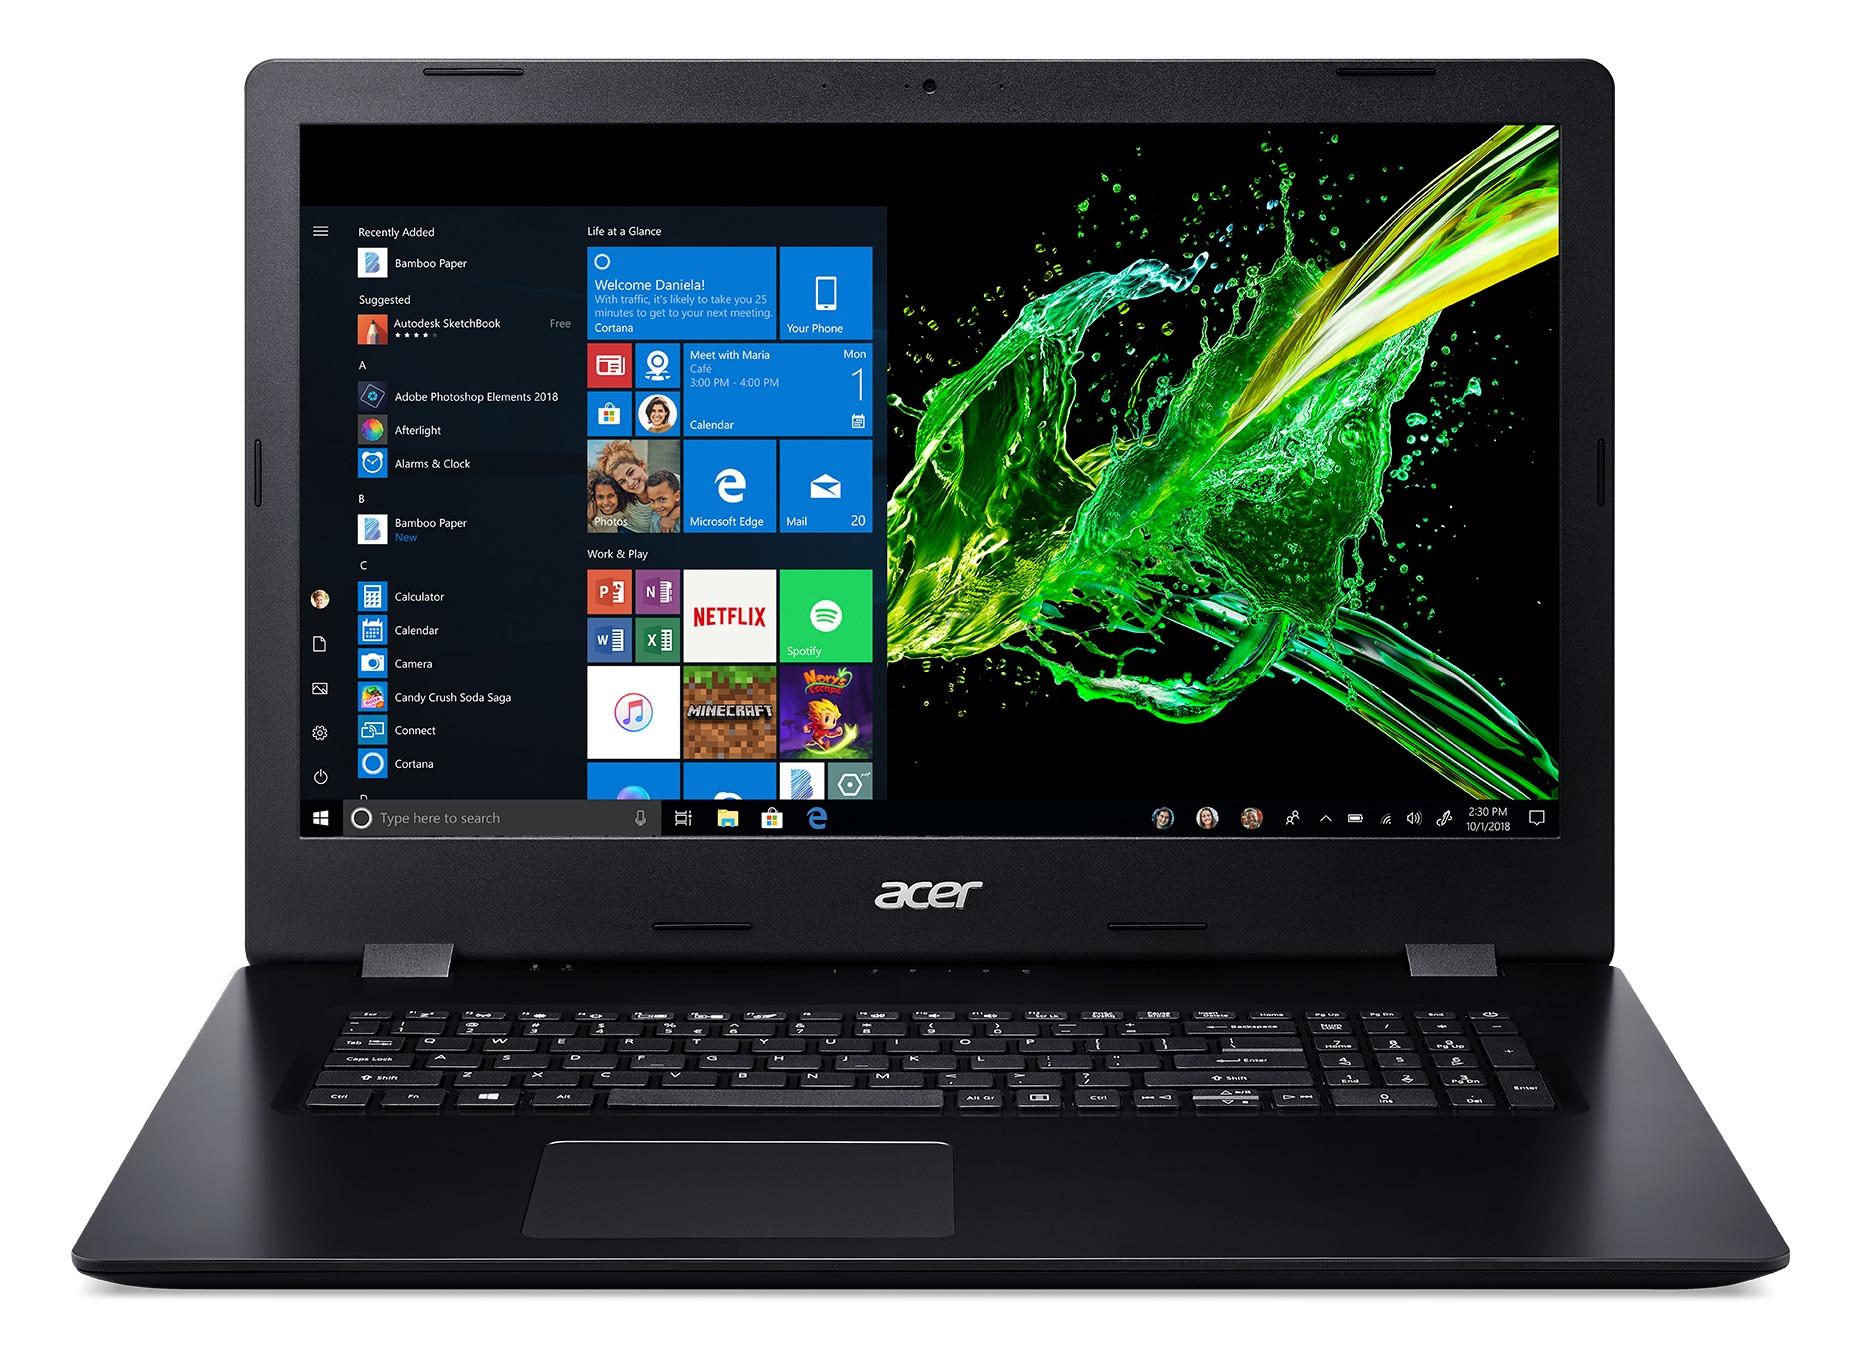 Acer Aspire 3 A317-51-33N7 laptop